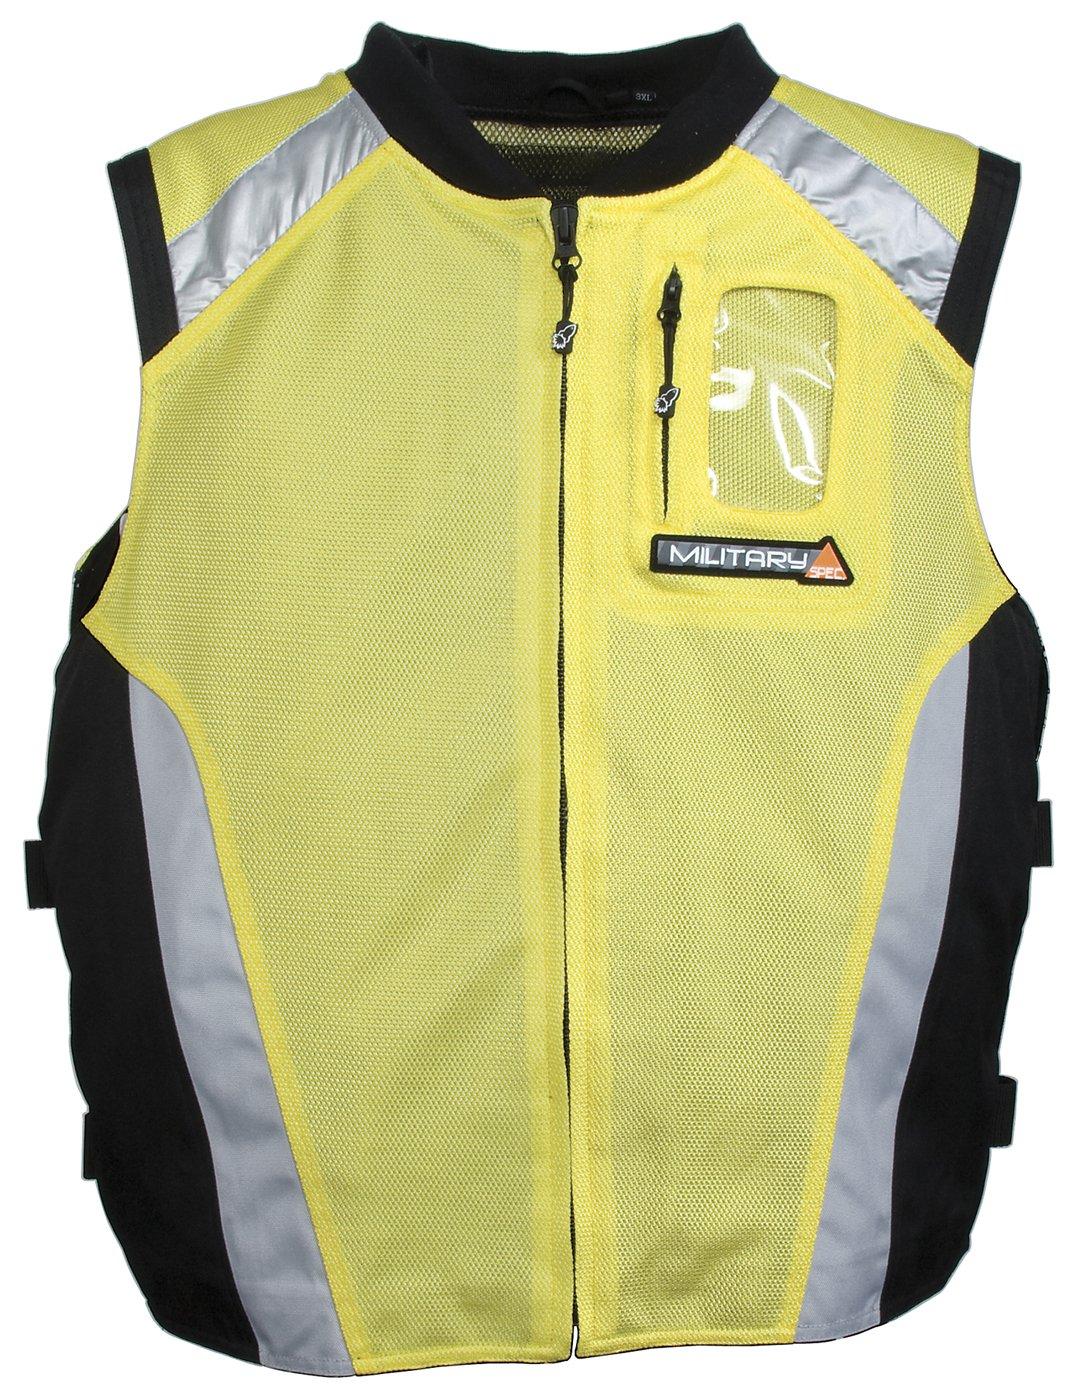 Joe Rocket Men's Military Spec Mesh Vest (Yellow, XX-Large/XXX-Large) 9052-1406